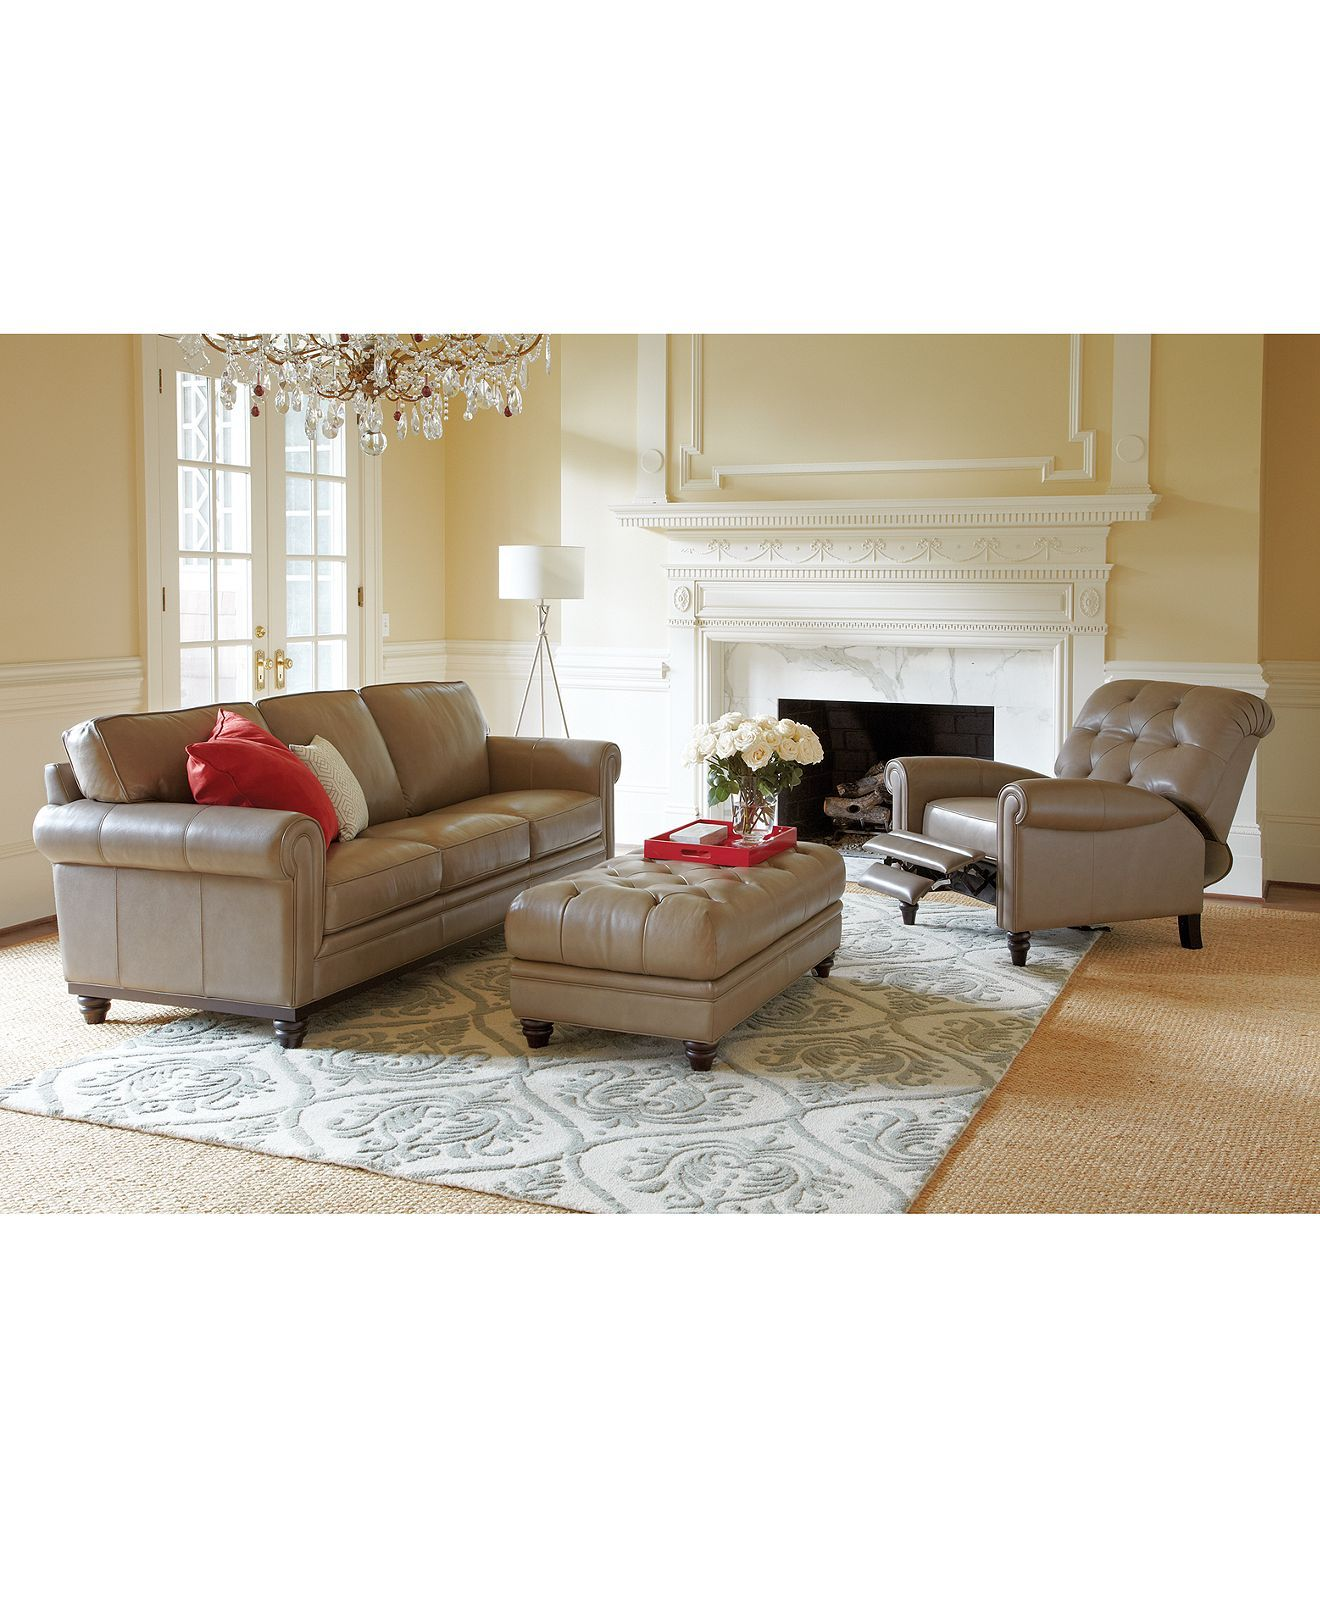 Martha Stewart Leather Living Room Furniture Sets & Pieces, Bradyn - Living Room F… | Leather Sofa Living Room, Leather Living Room Furniture, Living Room Furniture